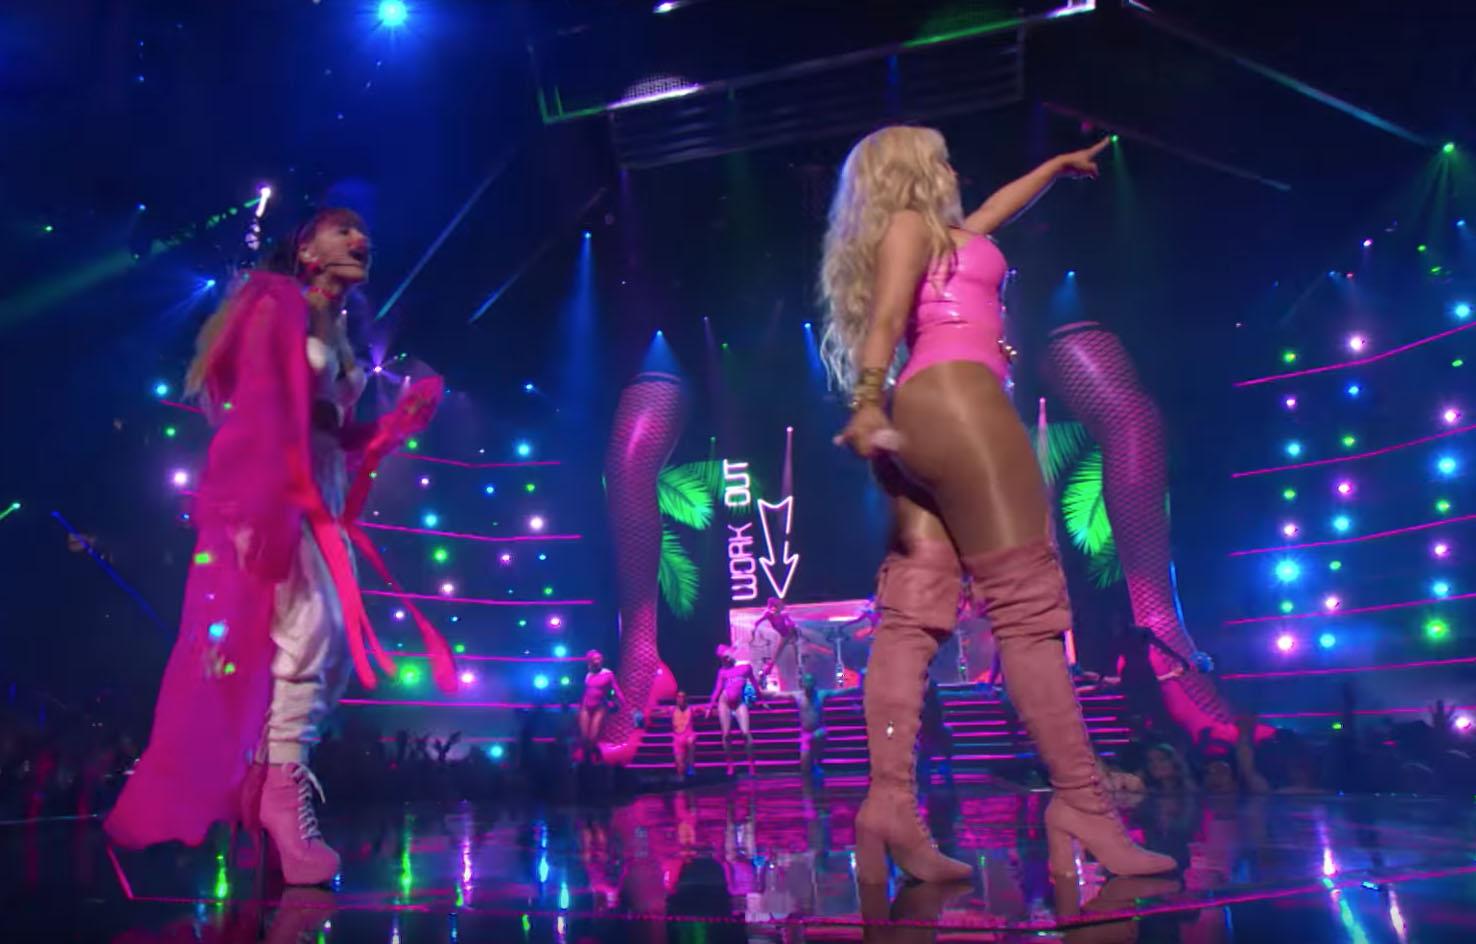 giant legs with Nicki Minaj and Ariana Grande